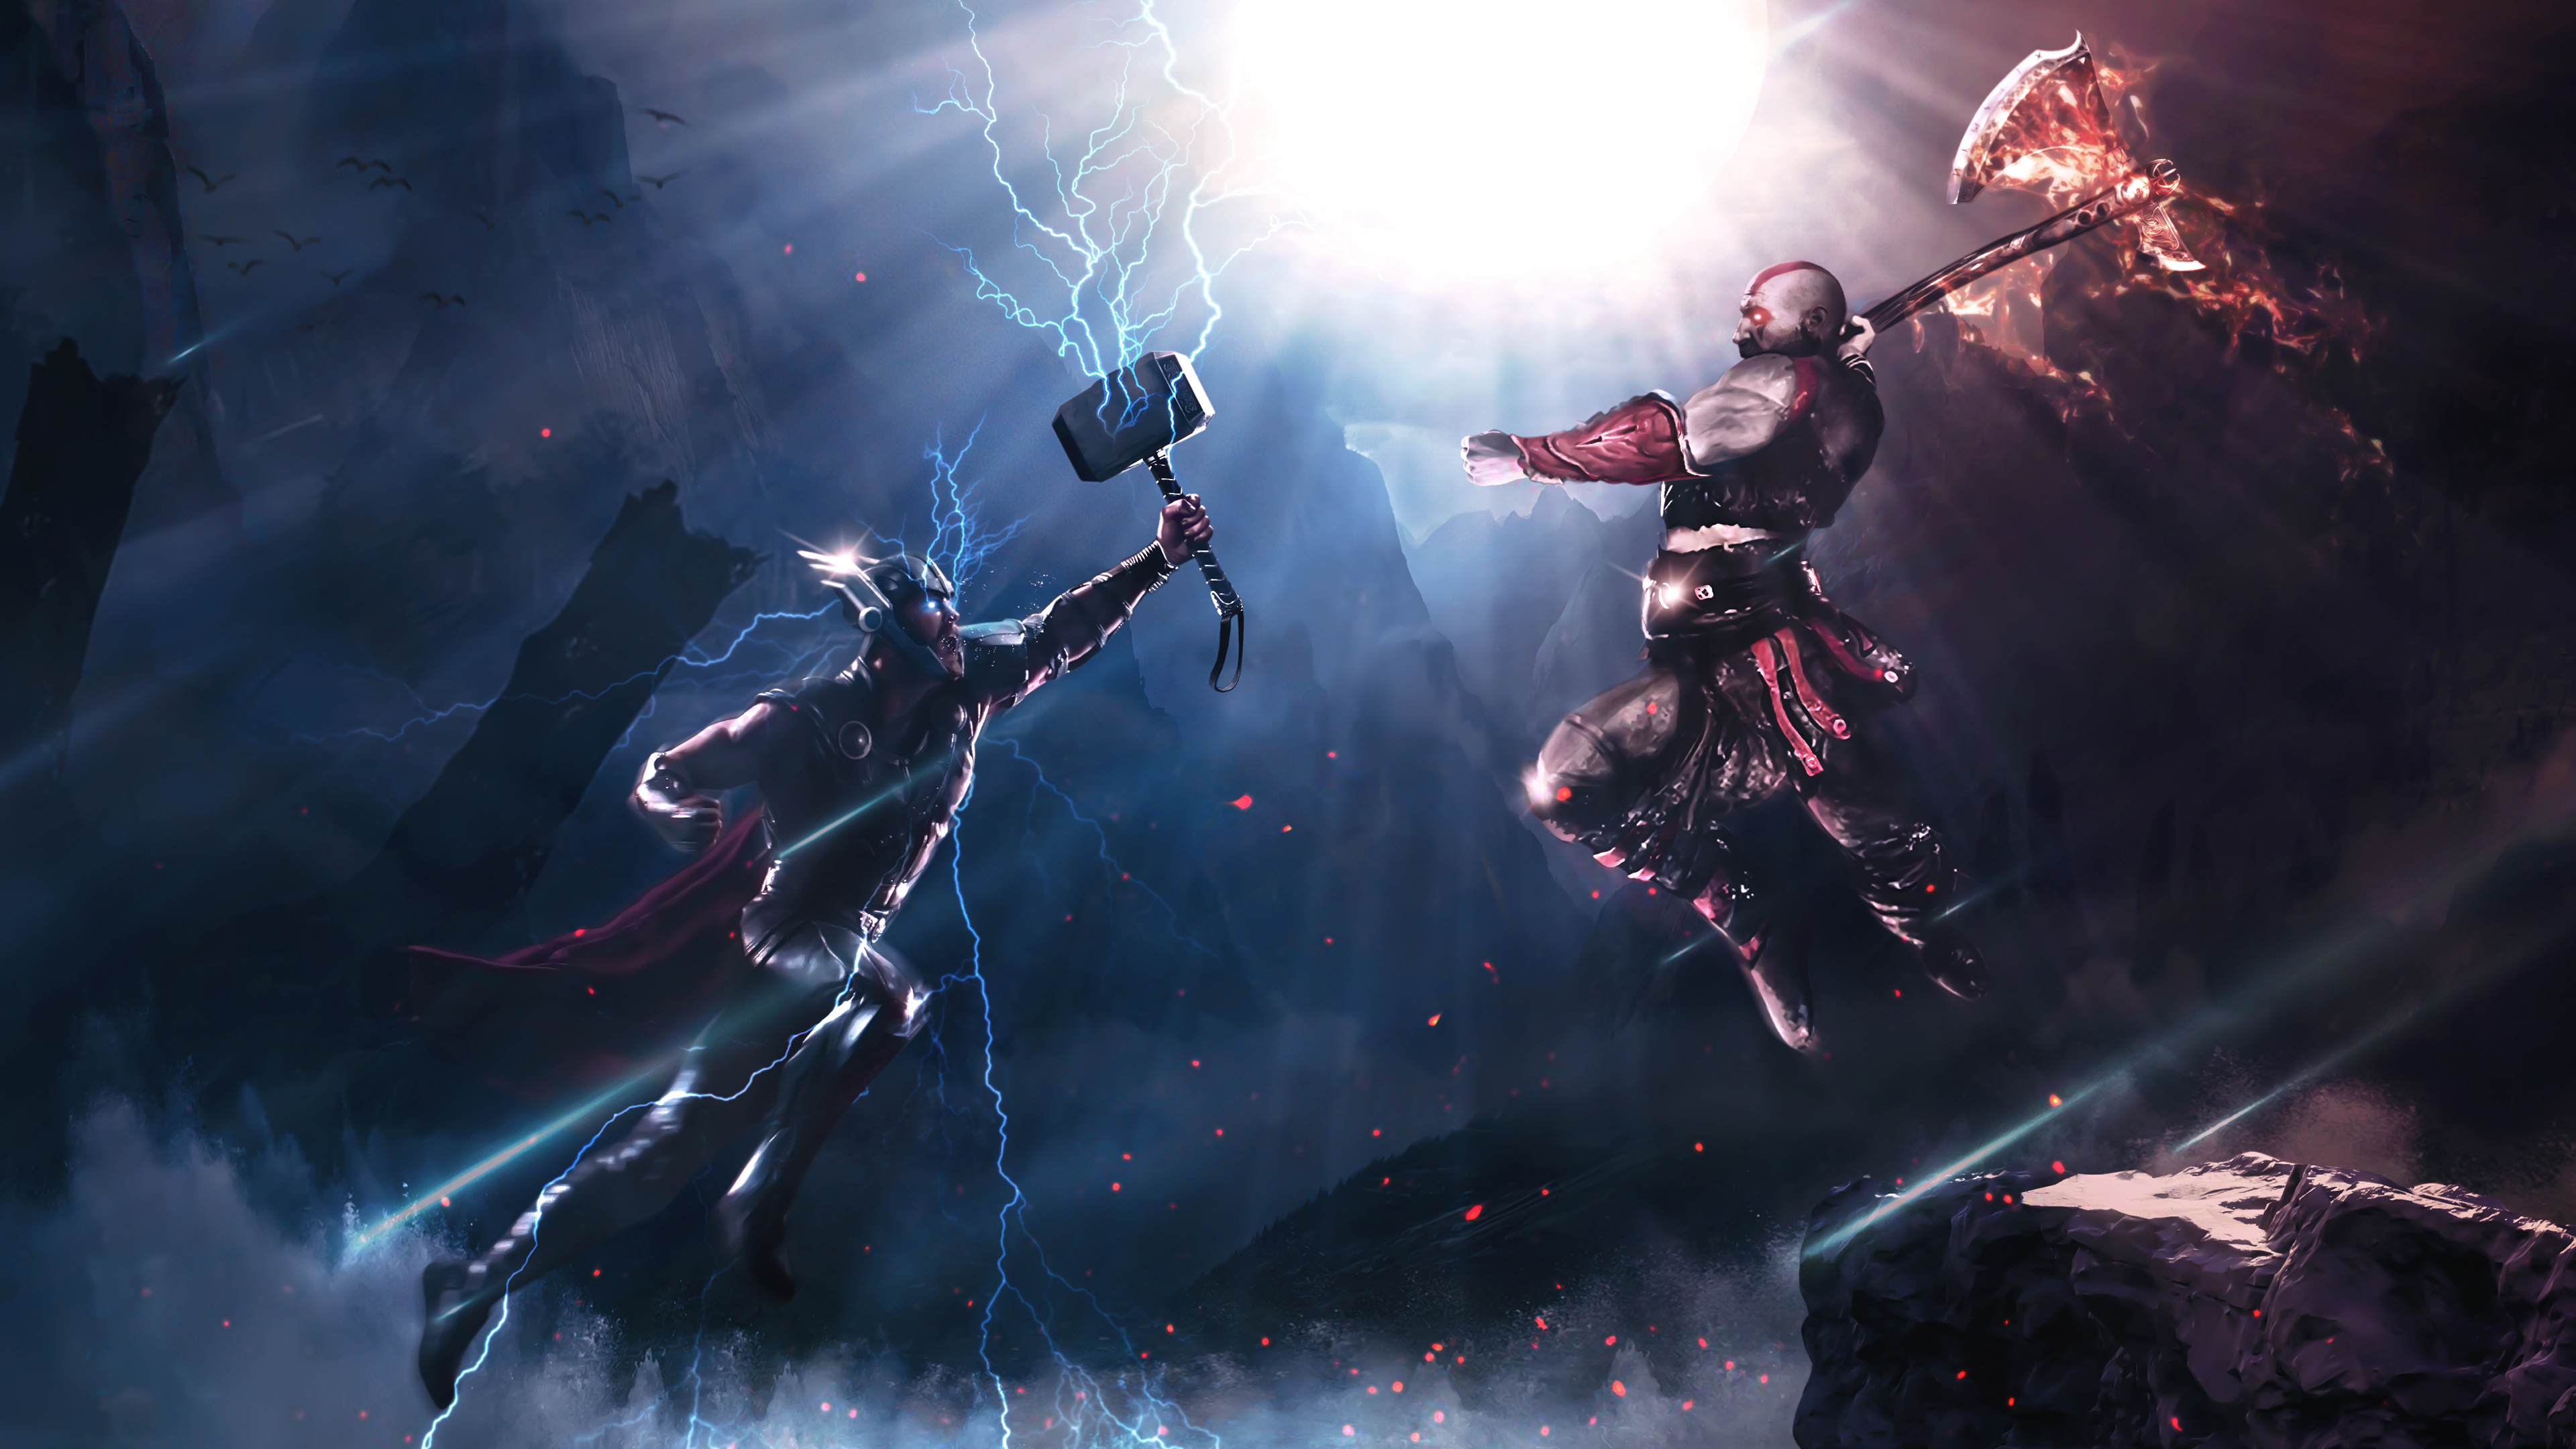 1600x900 Thor Vs Kratos 4k 1600x900 Resolution HD 4k